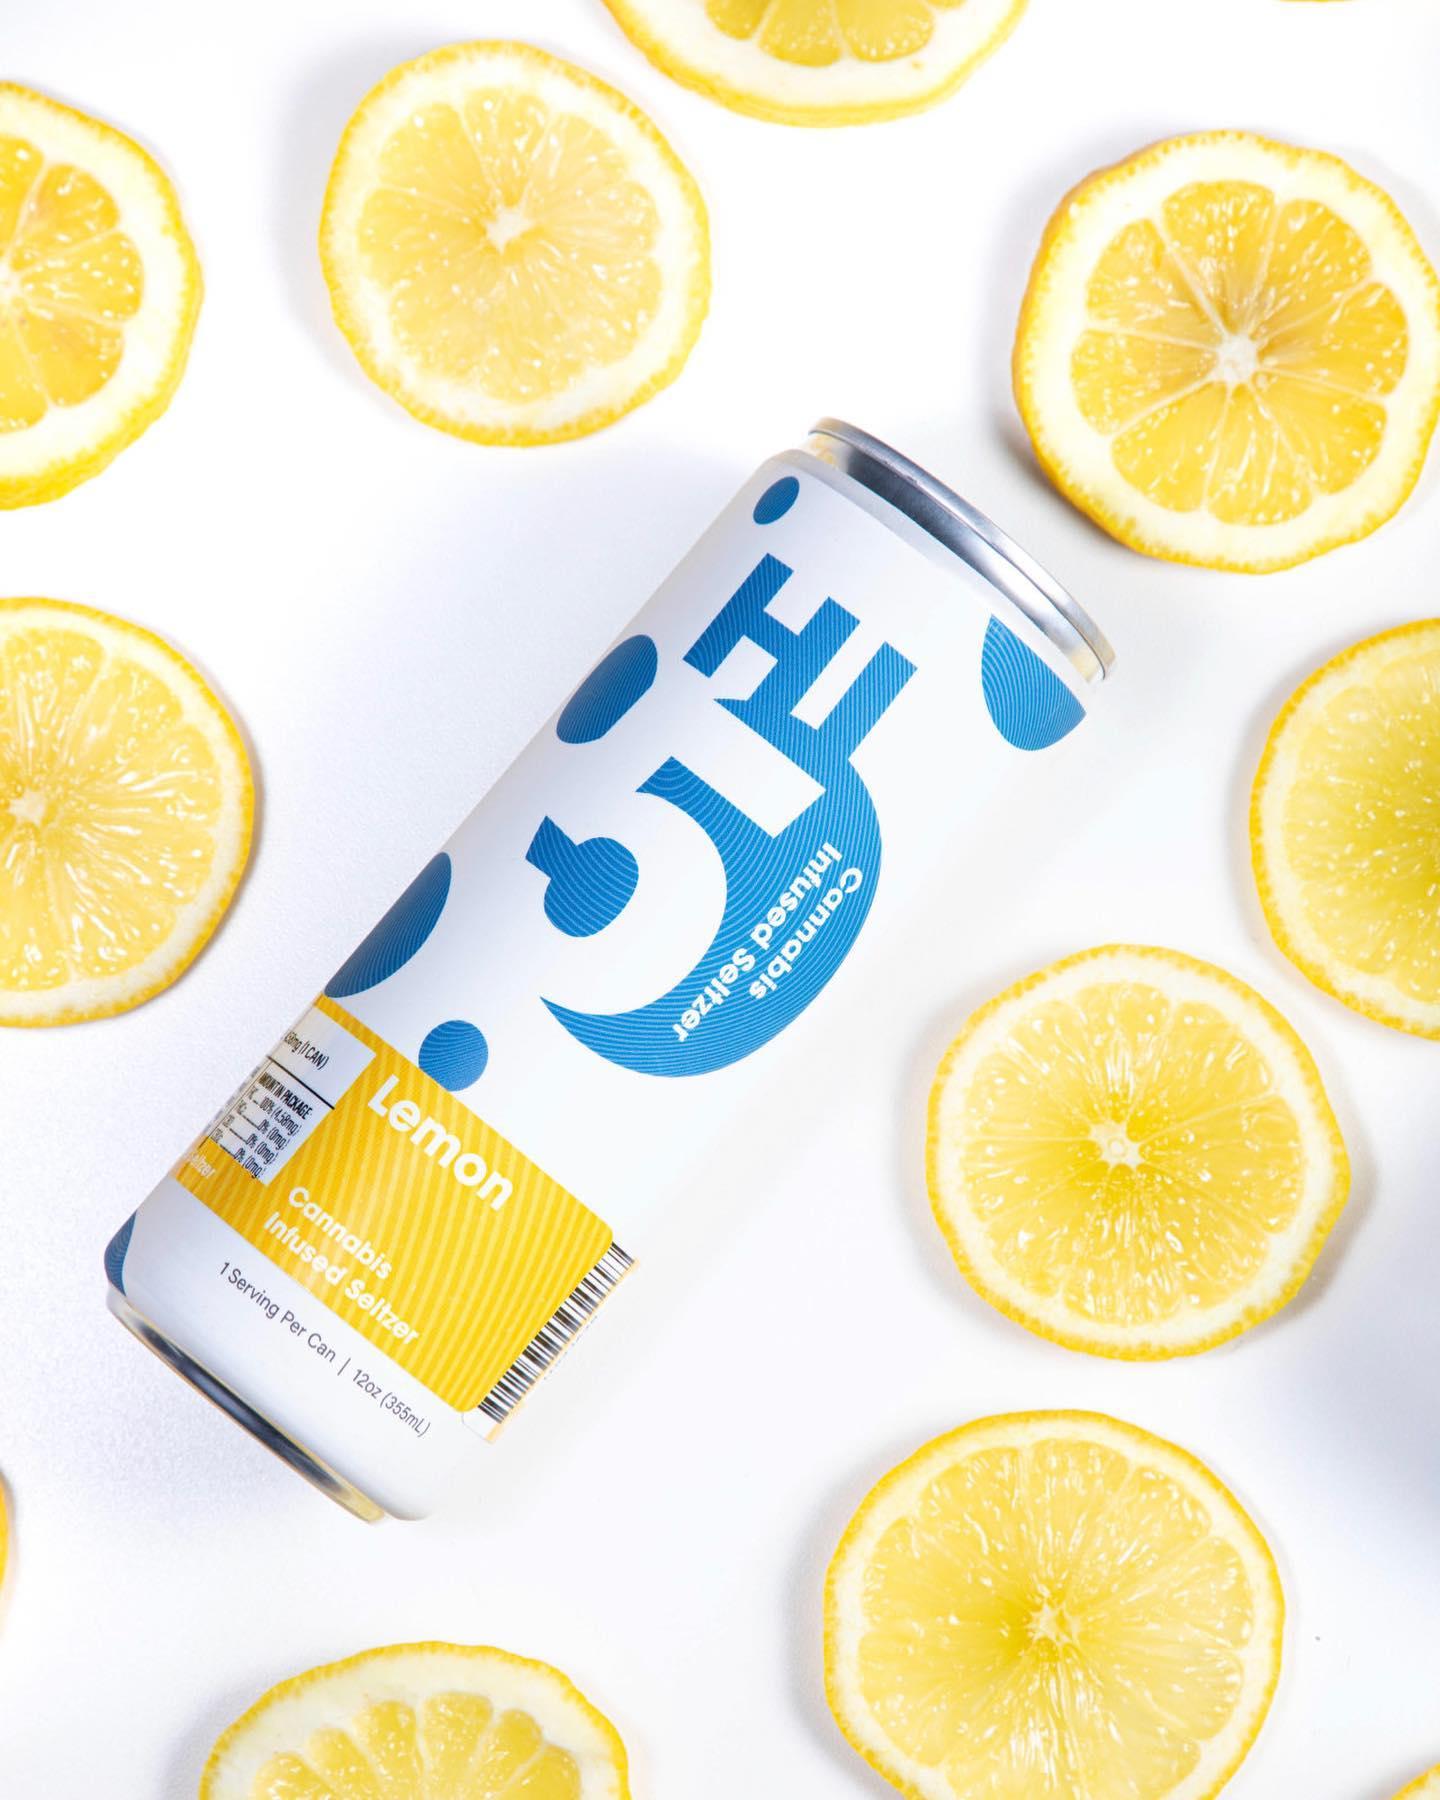 Lemon-Hi5-Refreshing-Cannabis-Drink